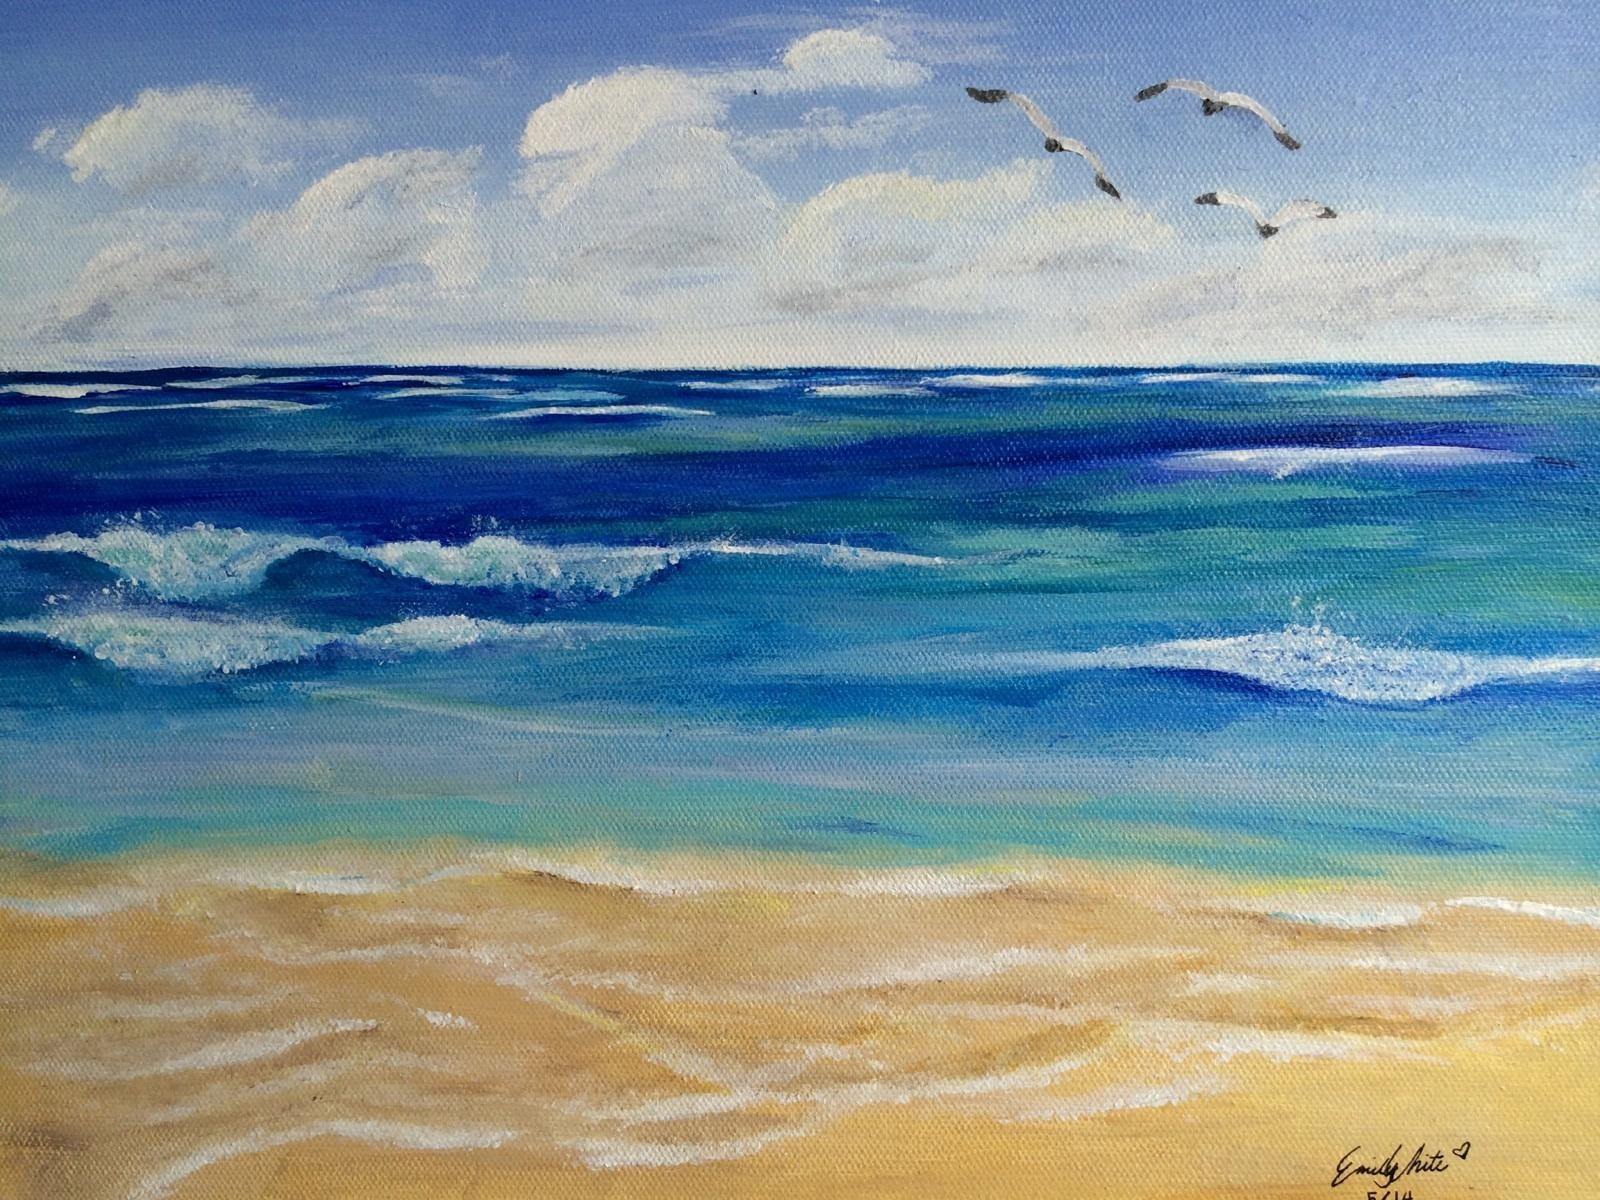 ART AND PHOTO GALLERY Gods Enduring Love - Ocean floor painting